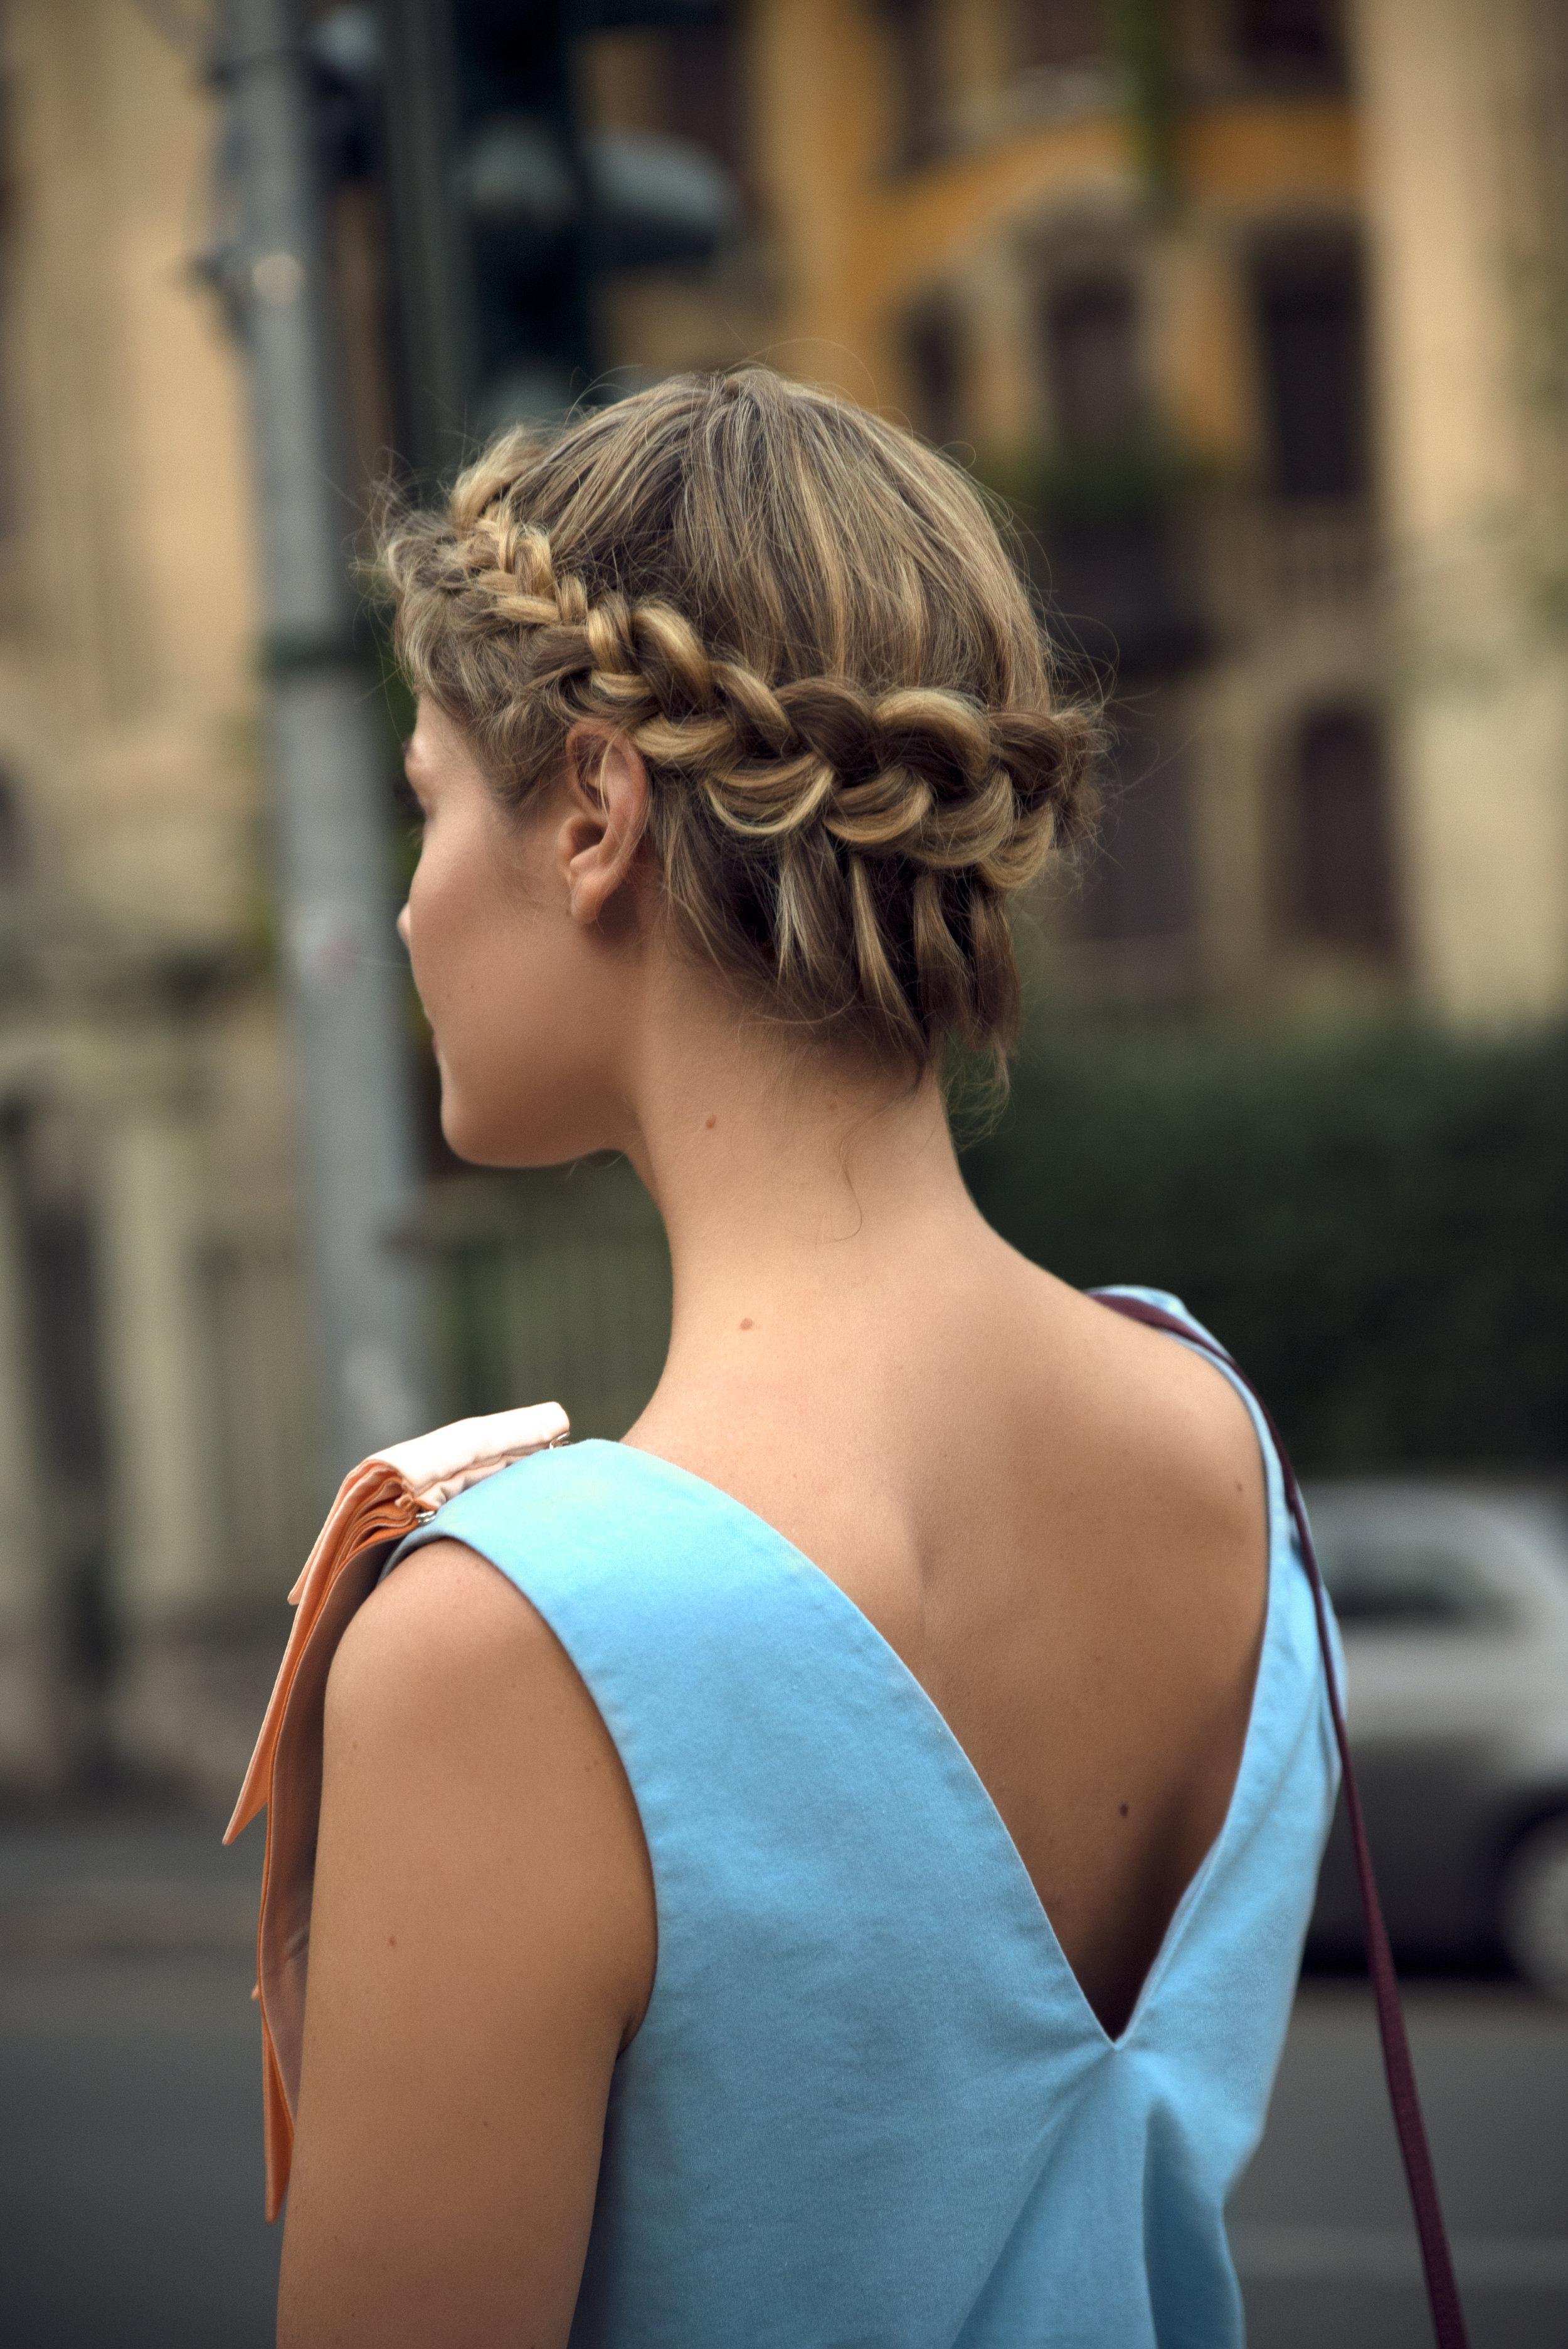 Hair by Mau Time at  Blow Hair Milan Salon